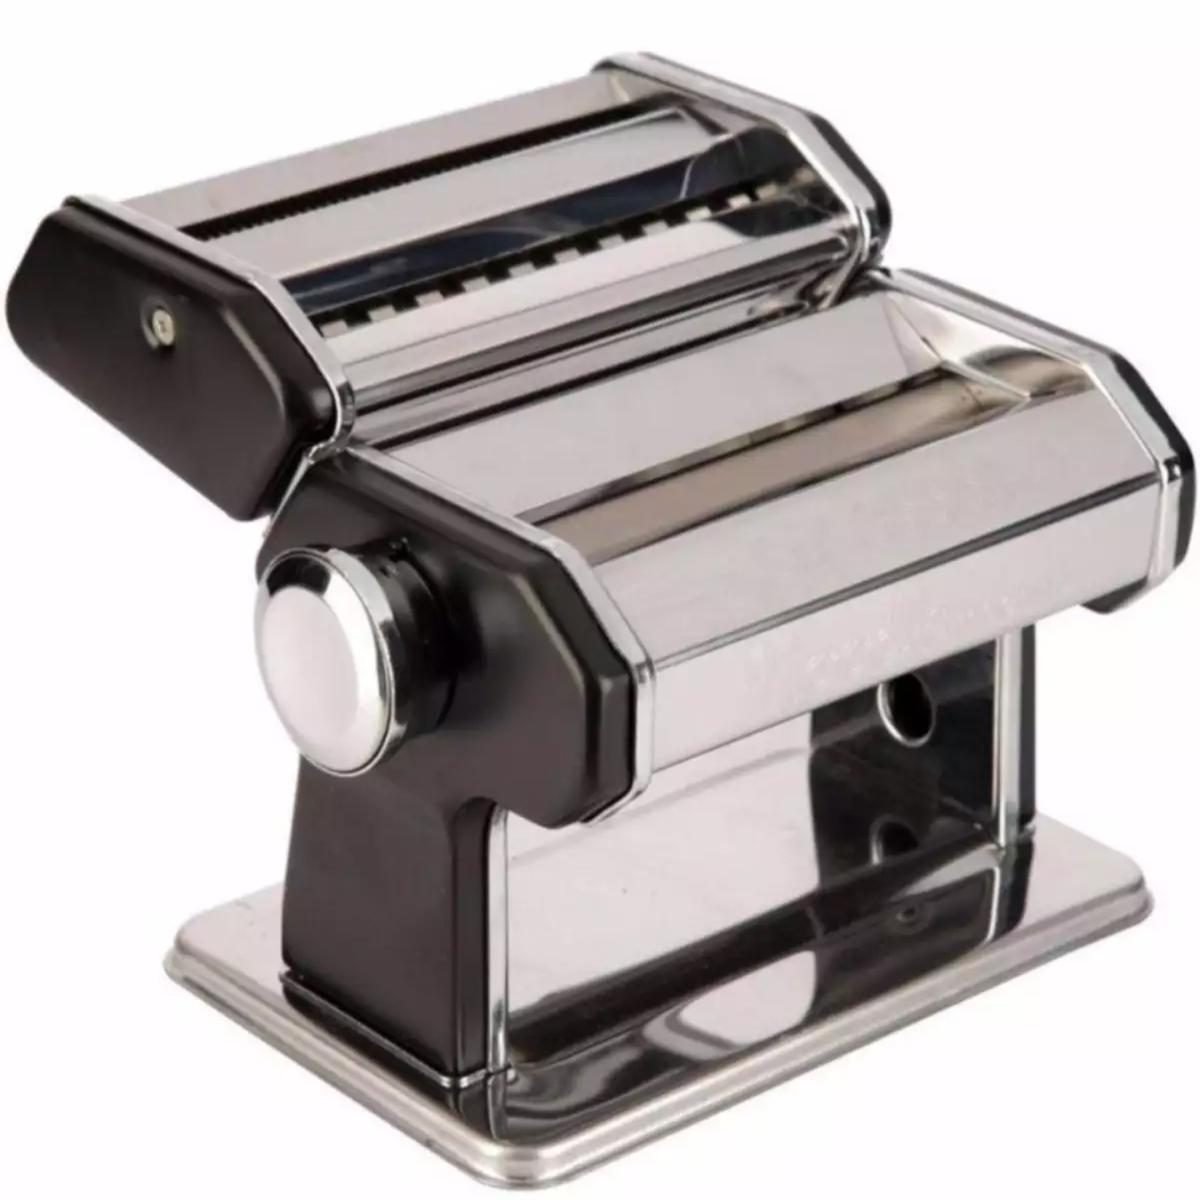 ... OXONE OX-355AT Pasta Maker/Gilingan Mie/Gilingan Molen - Silver GARANSI RESMI ...